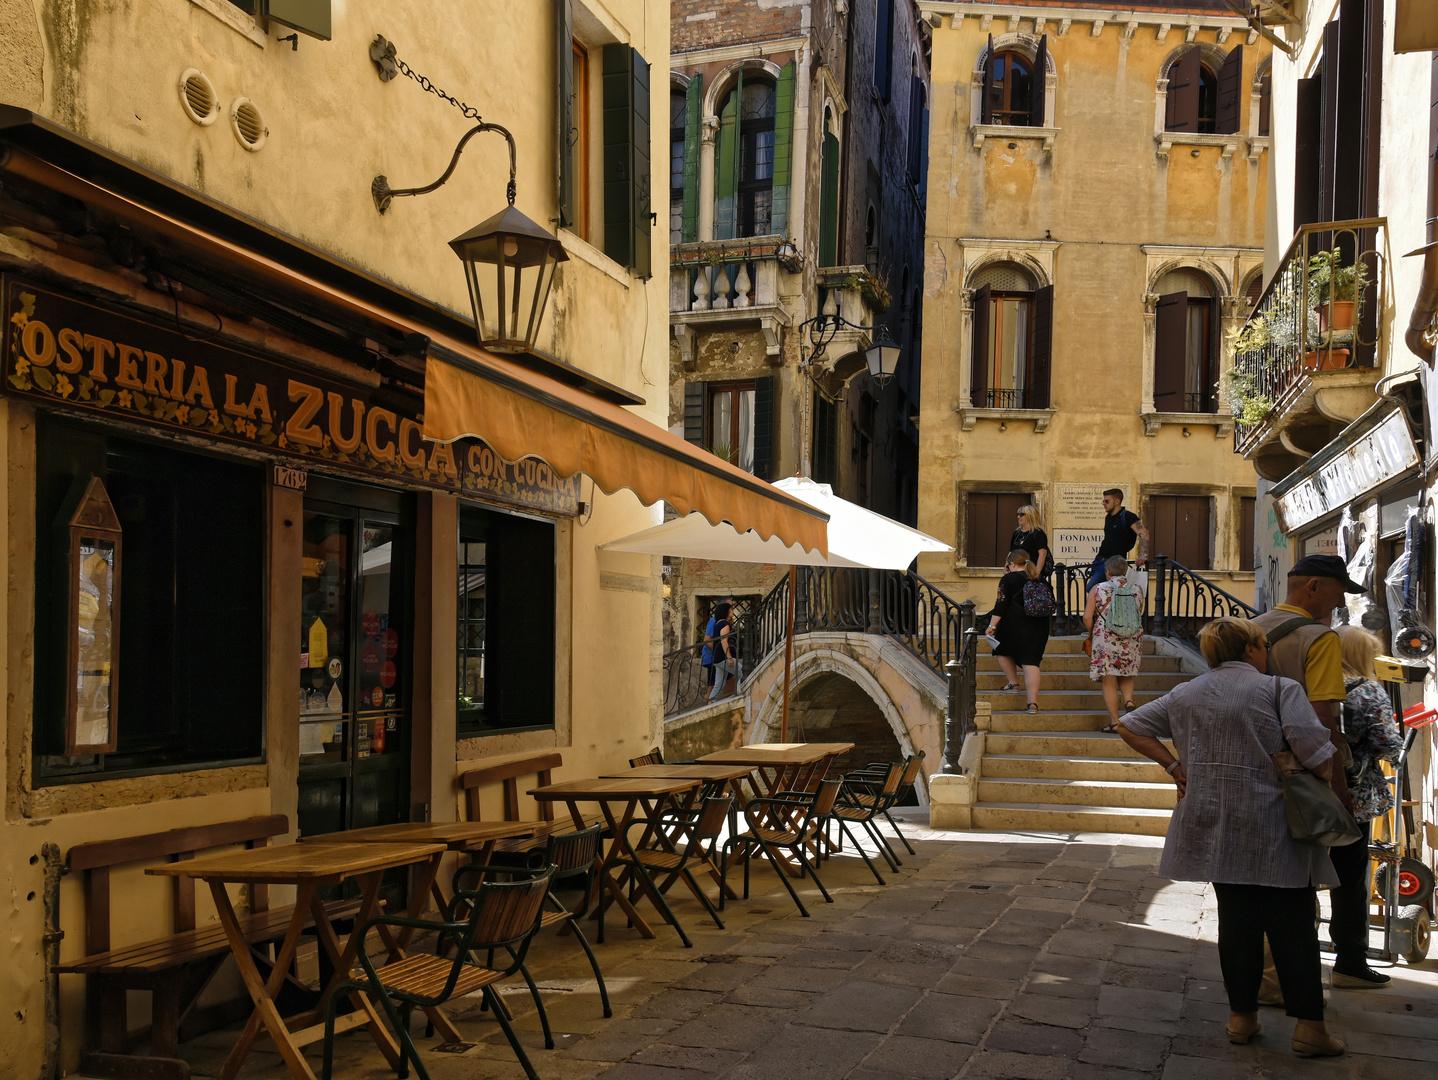 Osteria Venezia